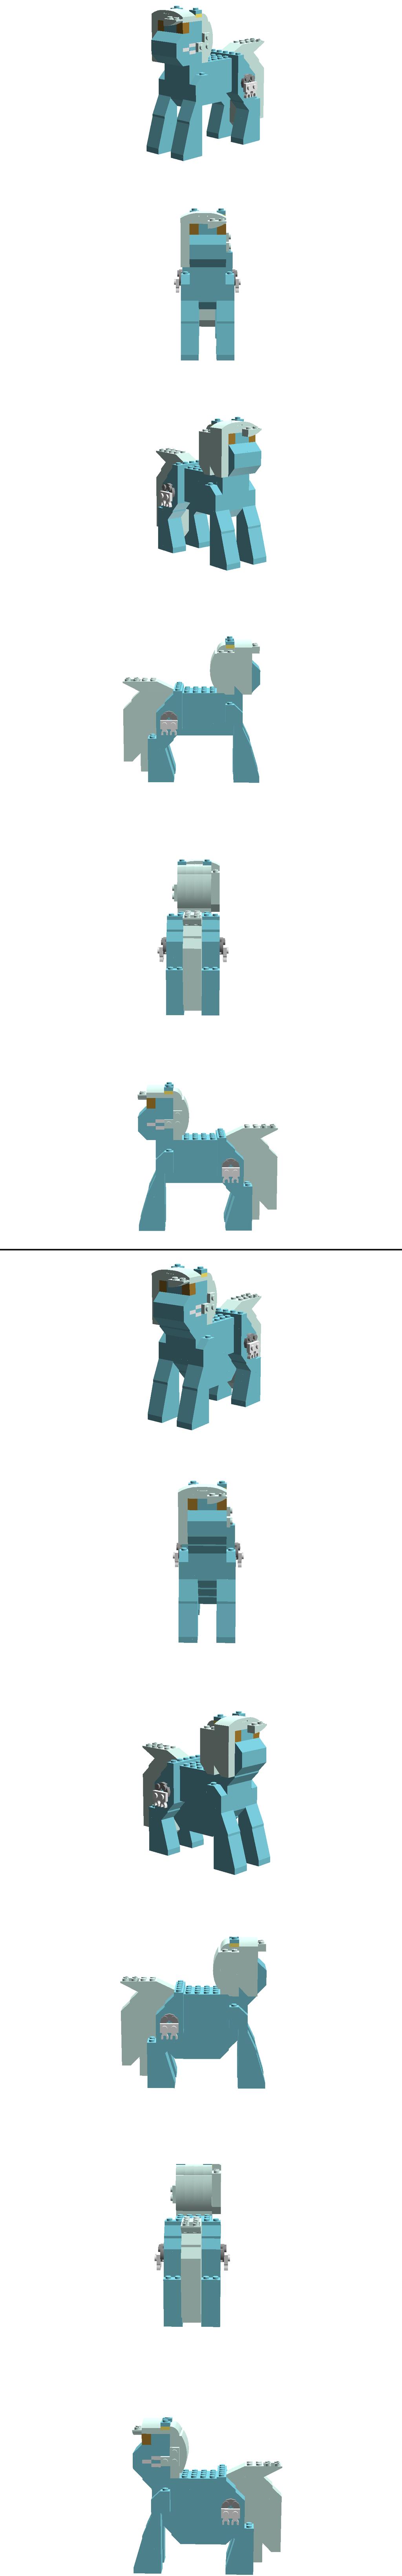 Lego Winter Gear by ThatRandomNerd